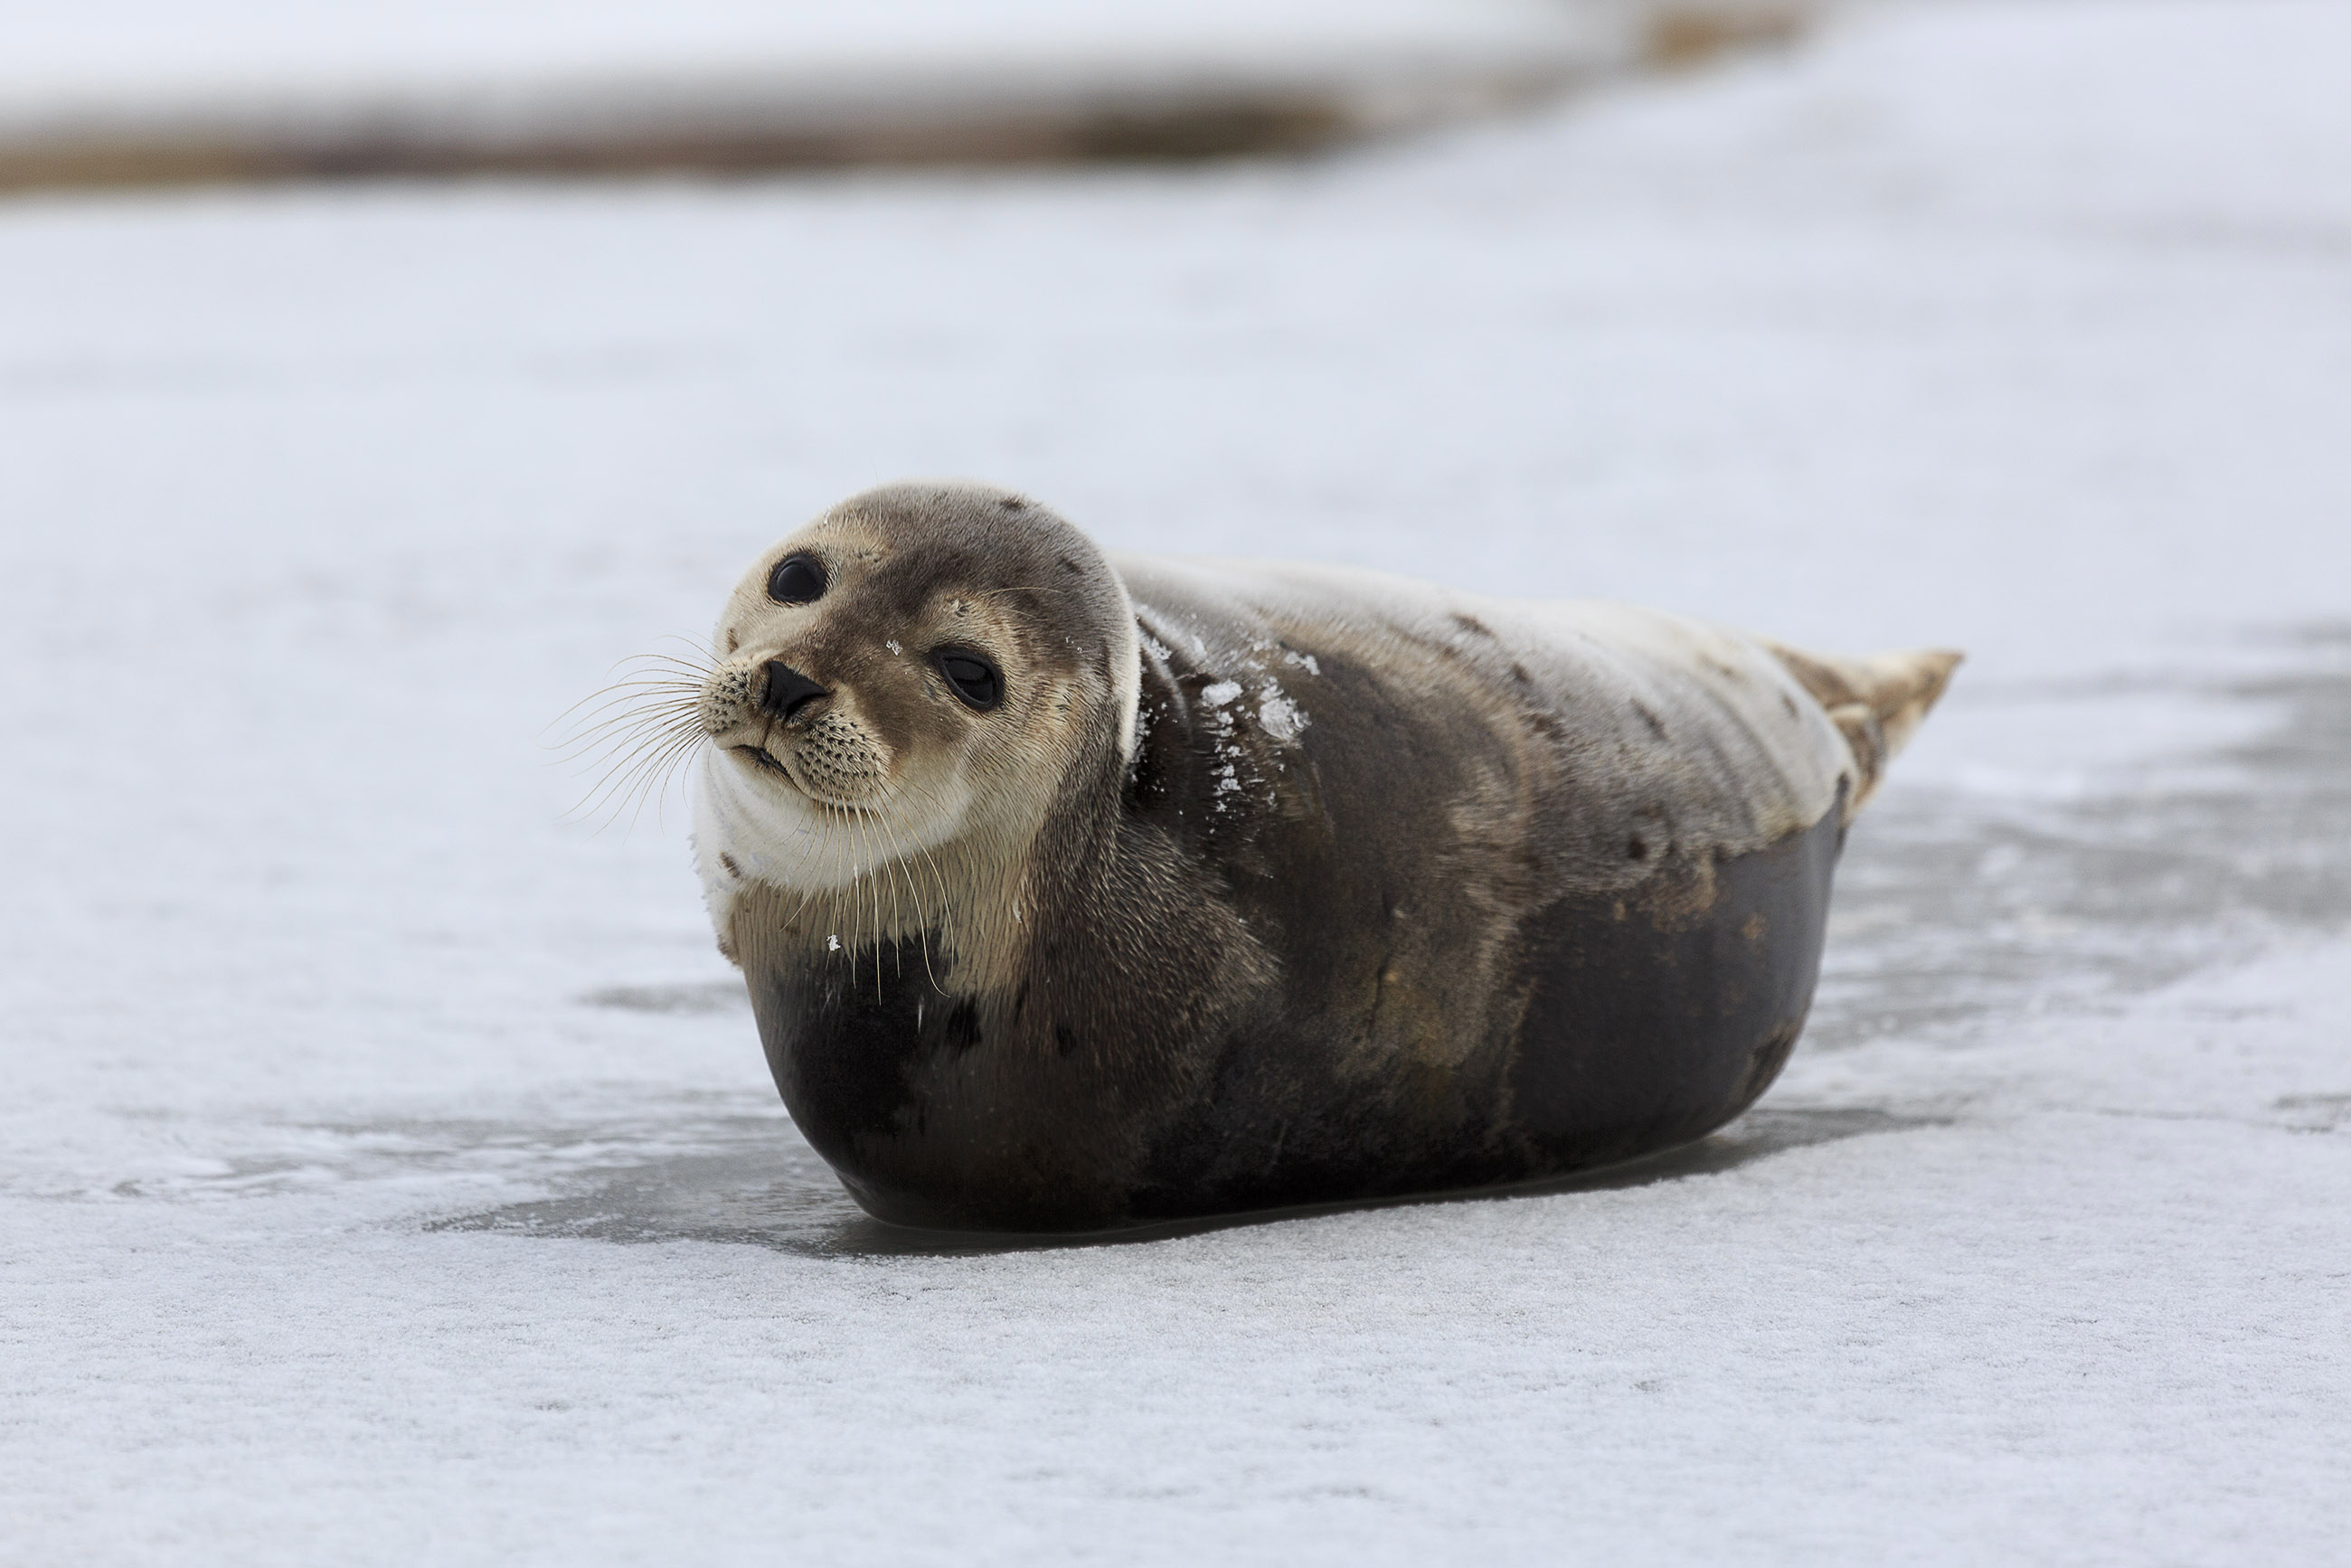 Harp seal photo